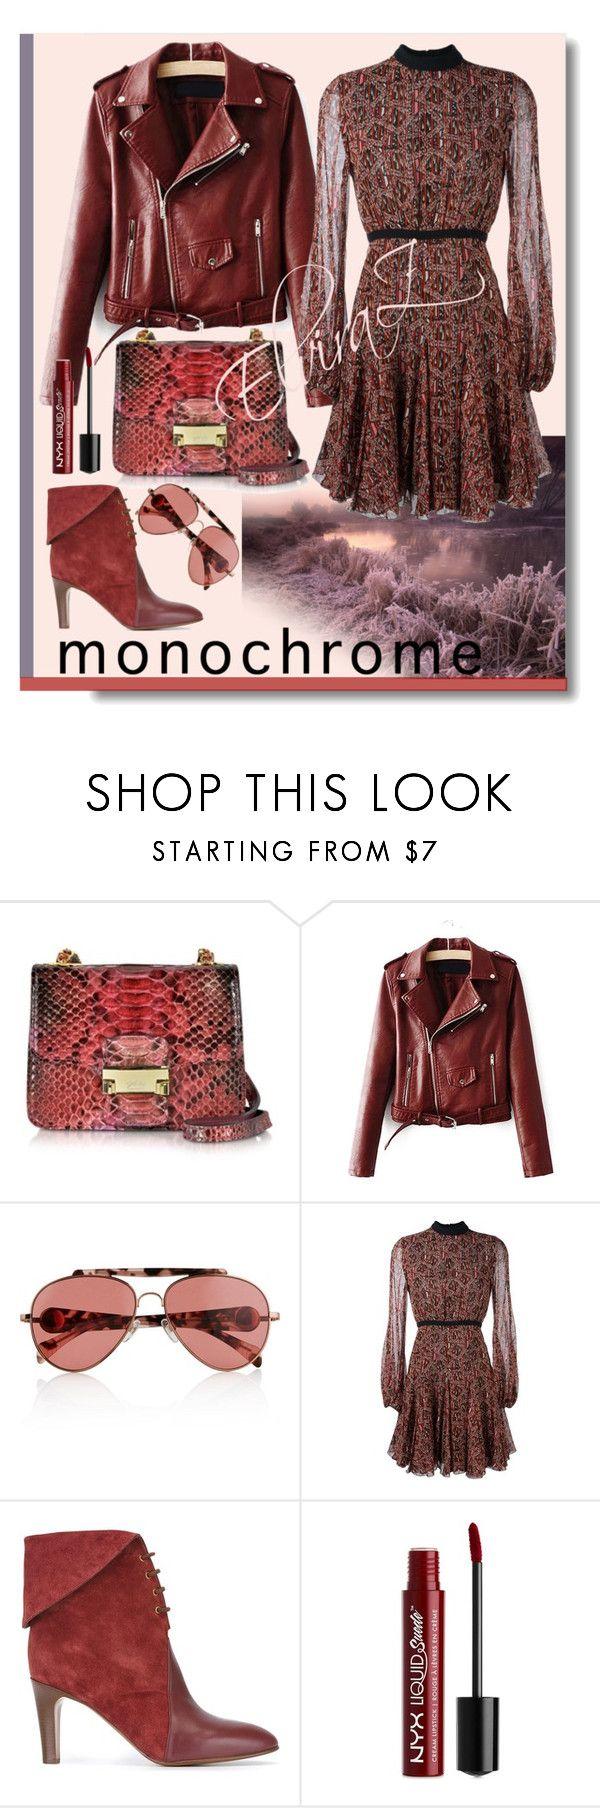 """monochrome"" by elza76 on Polyvore featuring мода, Ghibli, Tommy Hilfiger, Giambattista Valli, Chloé и NYX"